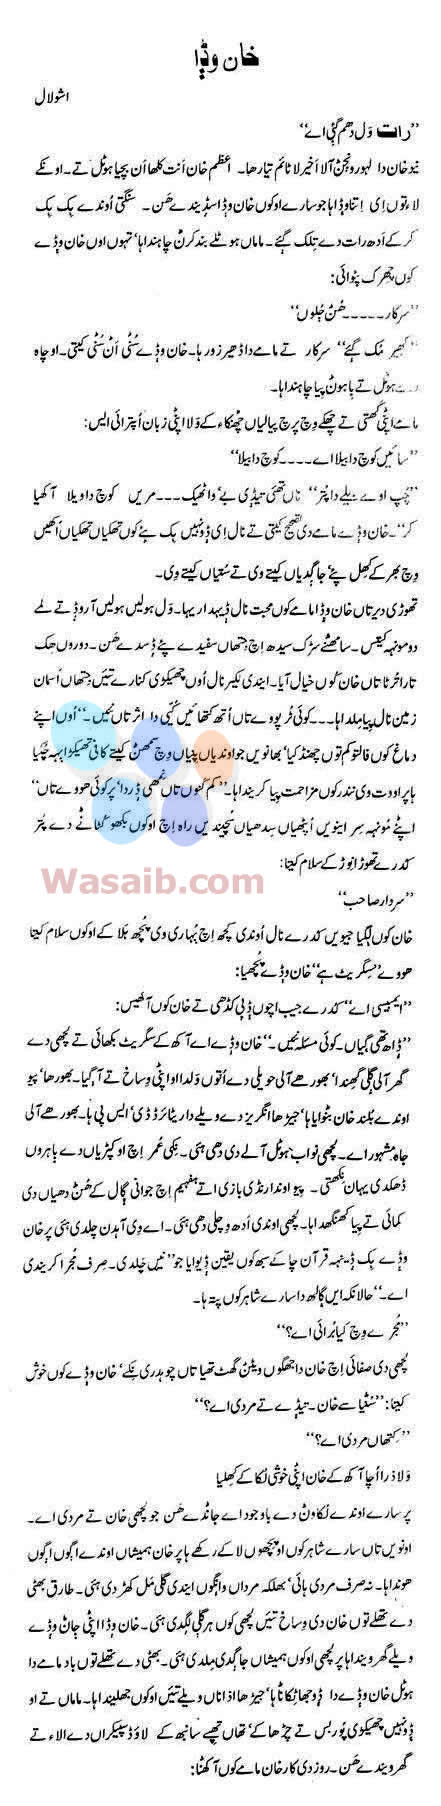 Seraiki Afsana Khan Wada (Ashoo Lal) Part-1